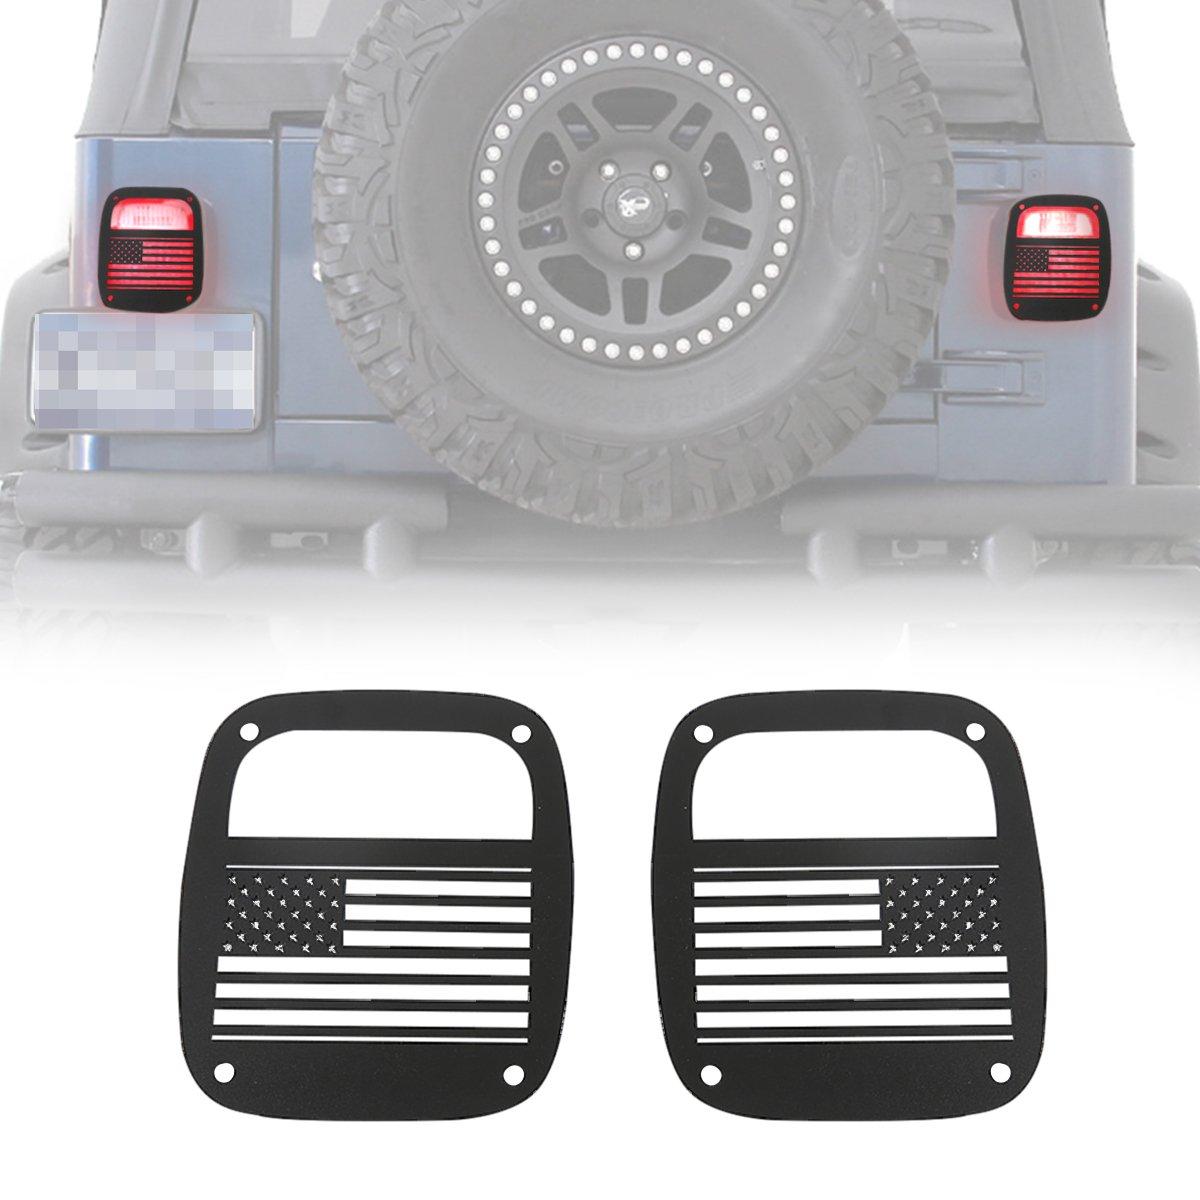 RT-TCZ Aluminum Black Rear Taillights Light Guard Tail Light Cover For 1997-2006 Jeep TJ Wrangler - Pair (USA Flag)